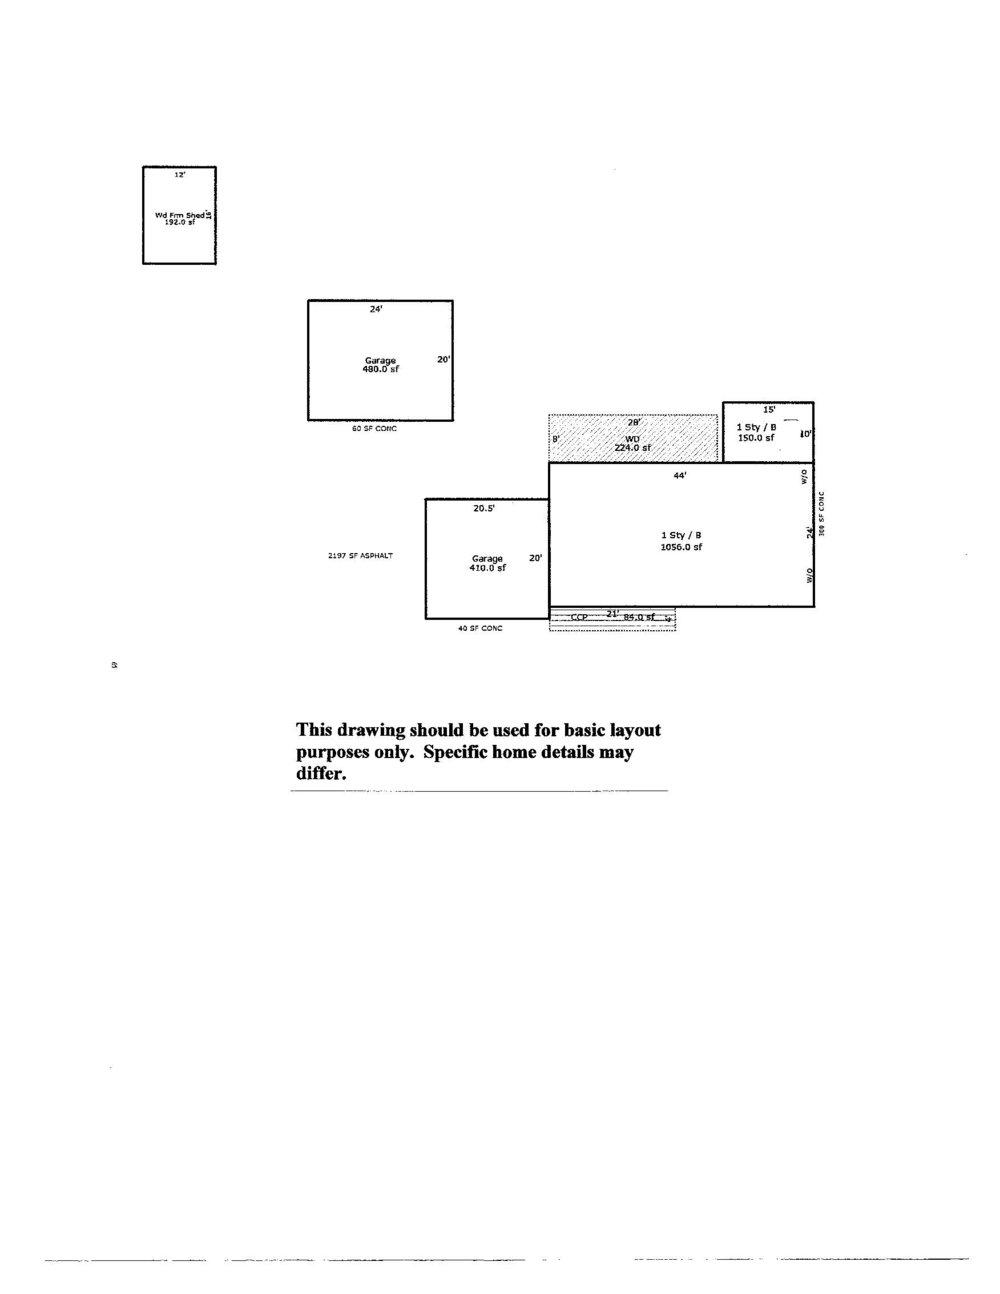 4903 Waldon Circle, Traverse City, MI – 3 Bedroom & 2 Bath Ranch Home for sale by Oltersdorf Realty LLC marketing packet (7).jpg